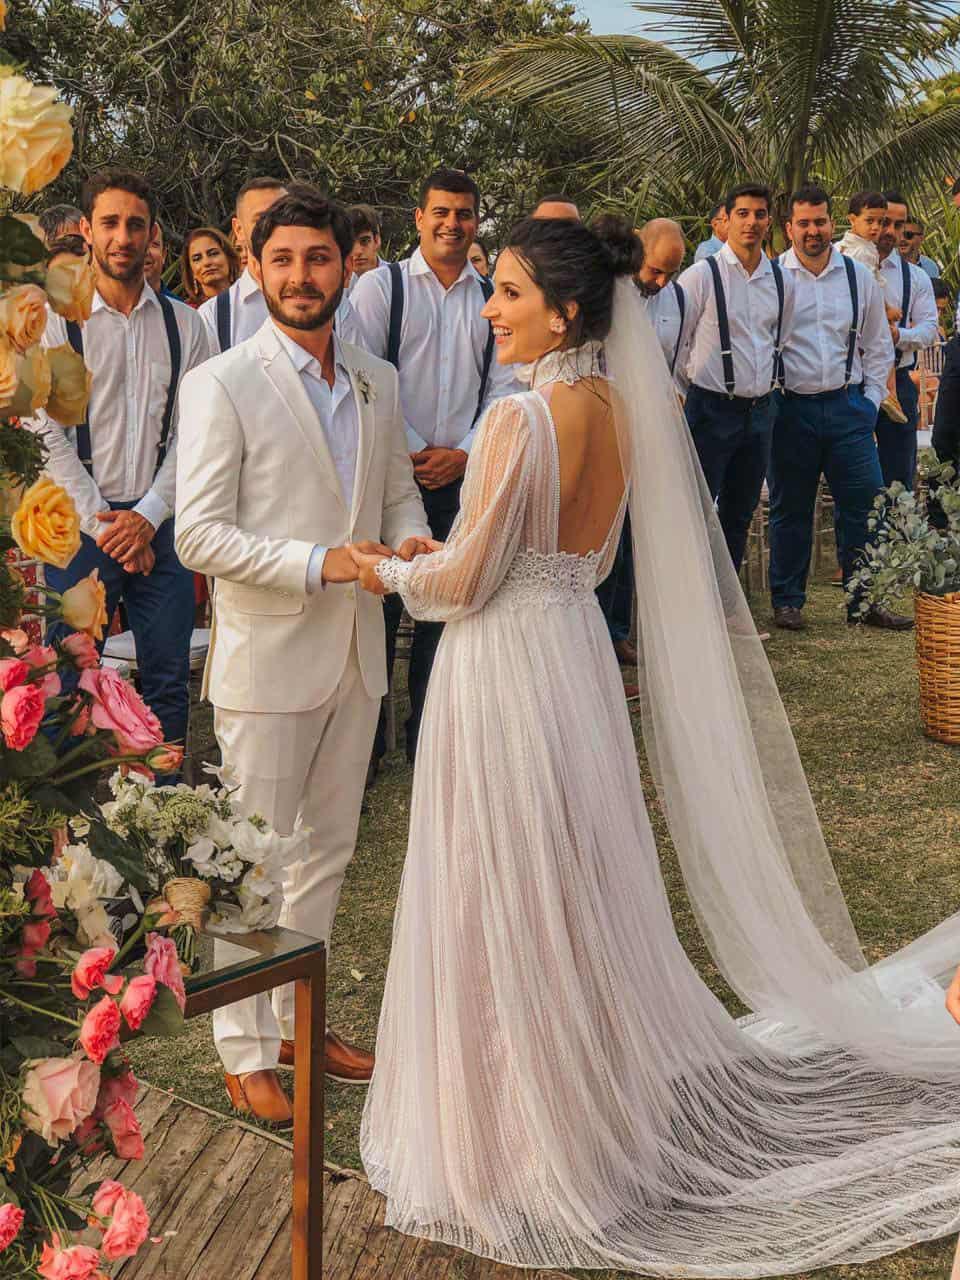 Casa-da-Maria-casamento-Mariana-e-Luan-Castelhanos-cerimonial-Vivianne-Melo-Espirito-Santo-Fotografia-Mariana-Andrich40